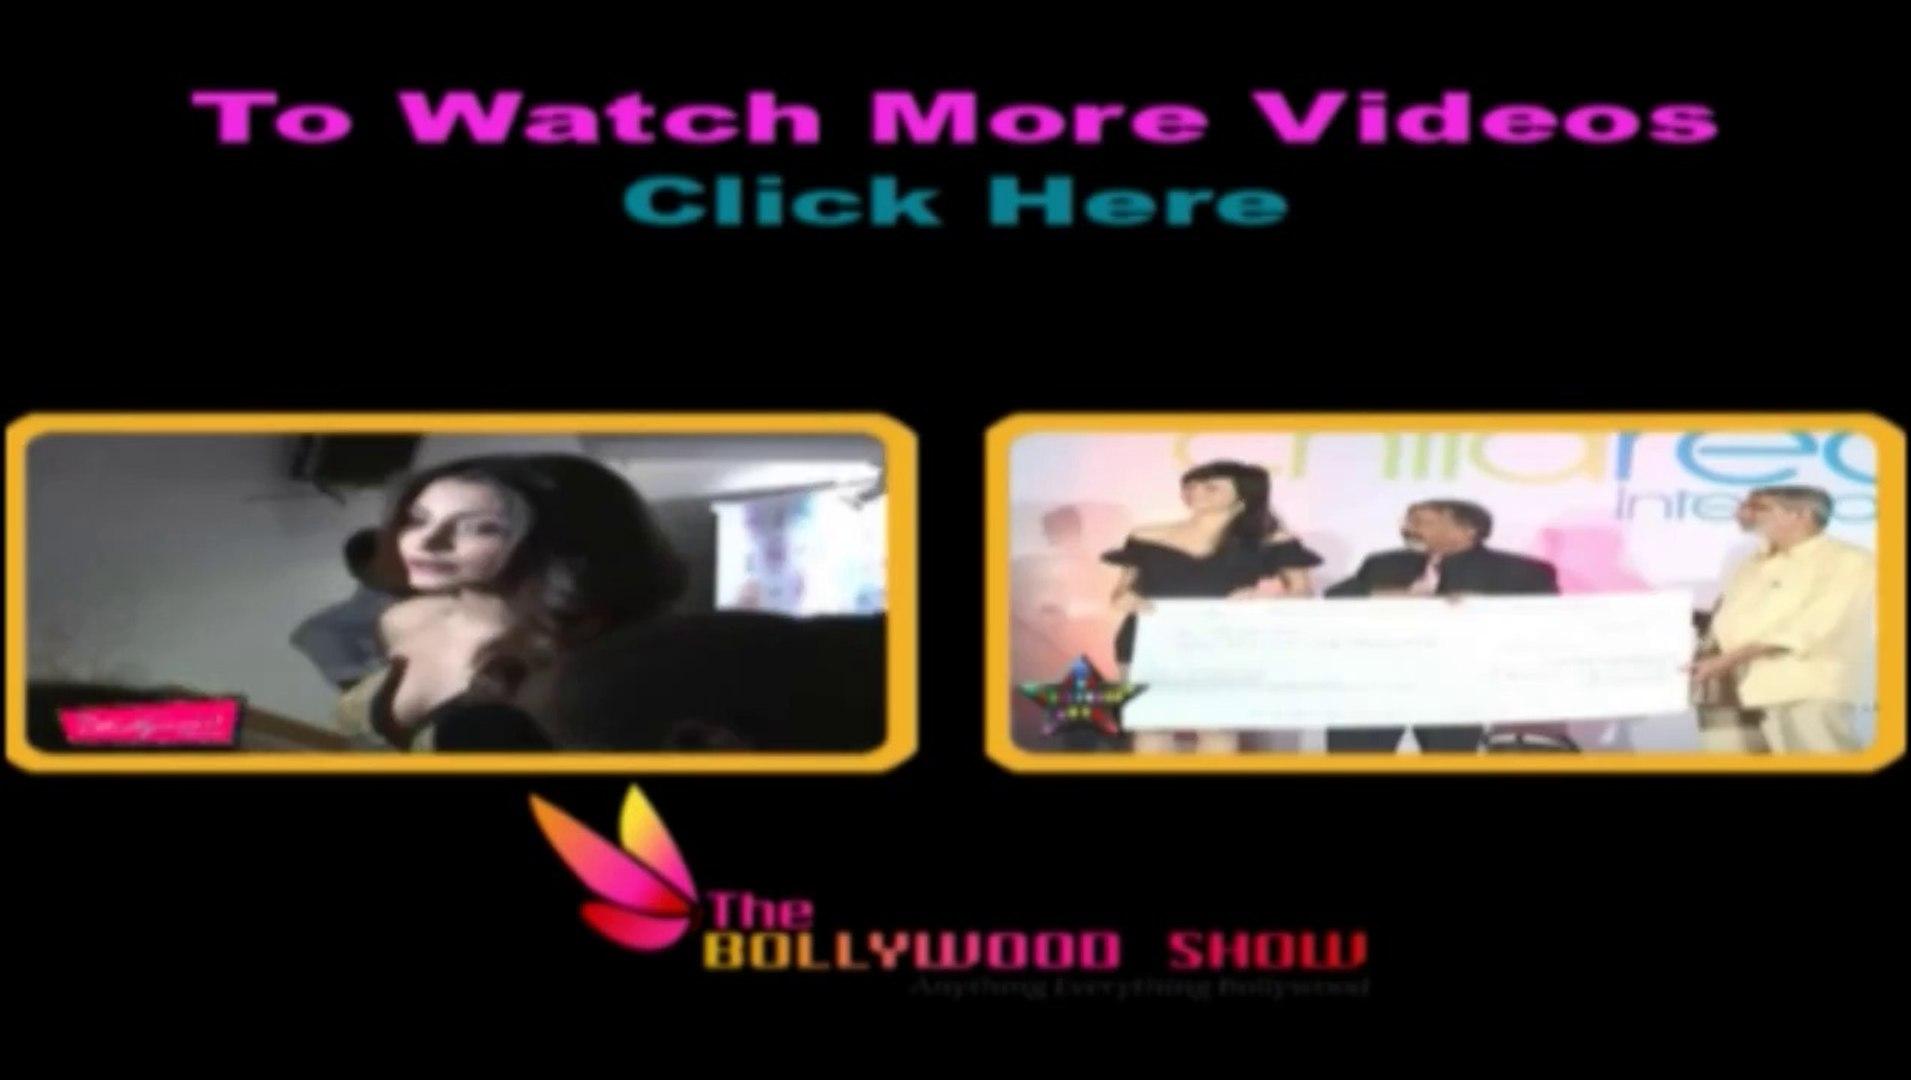 Jimmy Shergill Promotes Darr @ The Mall Movie @ Taarak Mehta Ka Ooltah Chashmah !